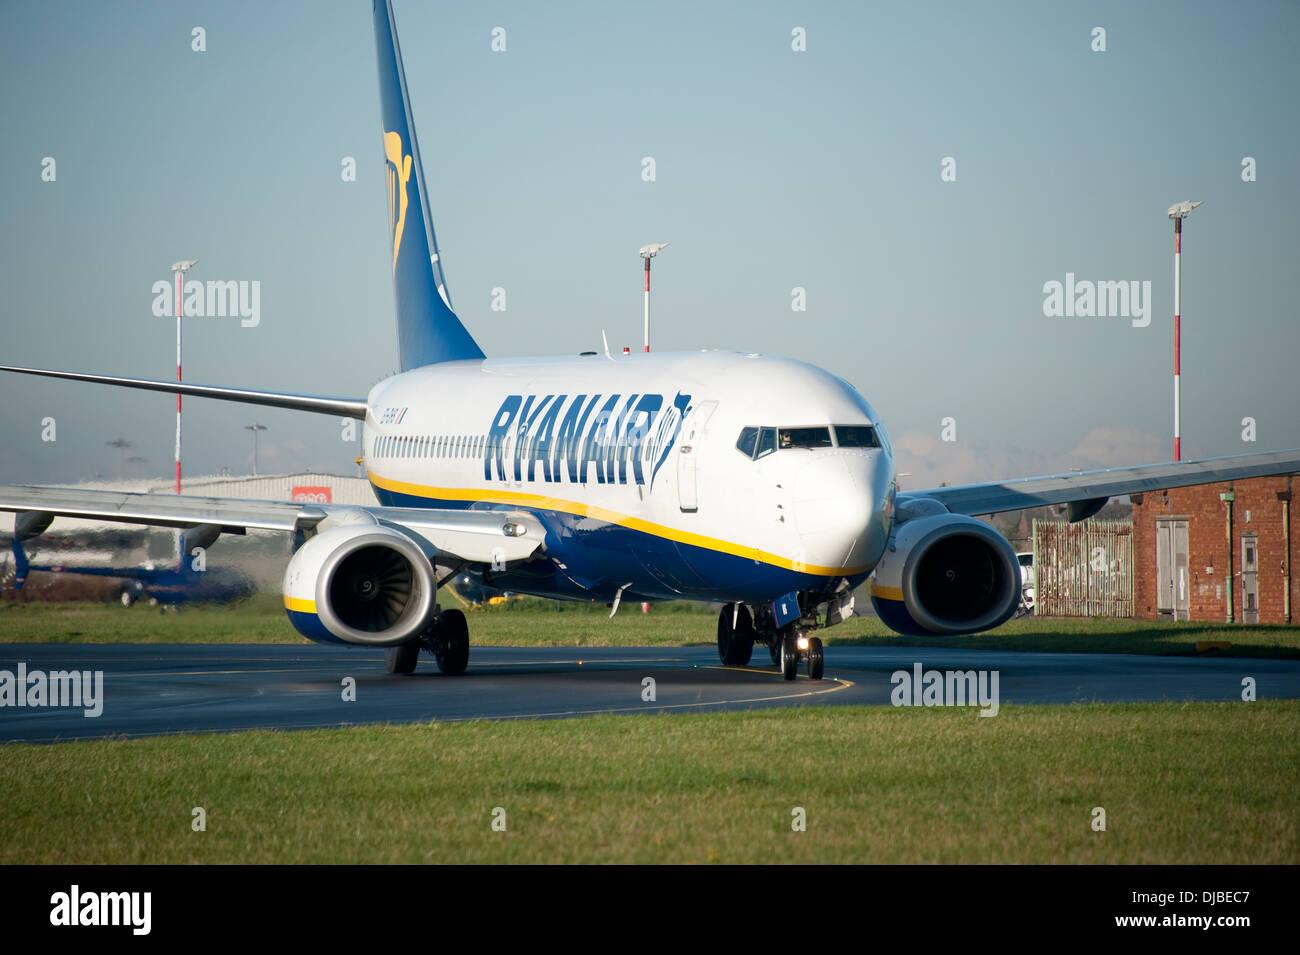 Ryanair Jet Plane at Liverpool John Lennon Airport - Stock Image